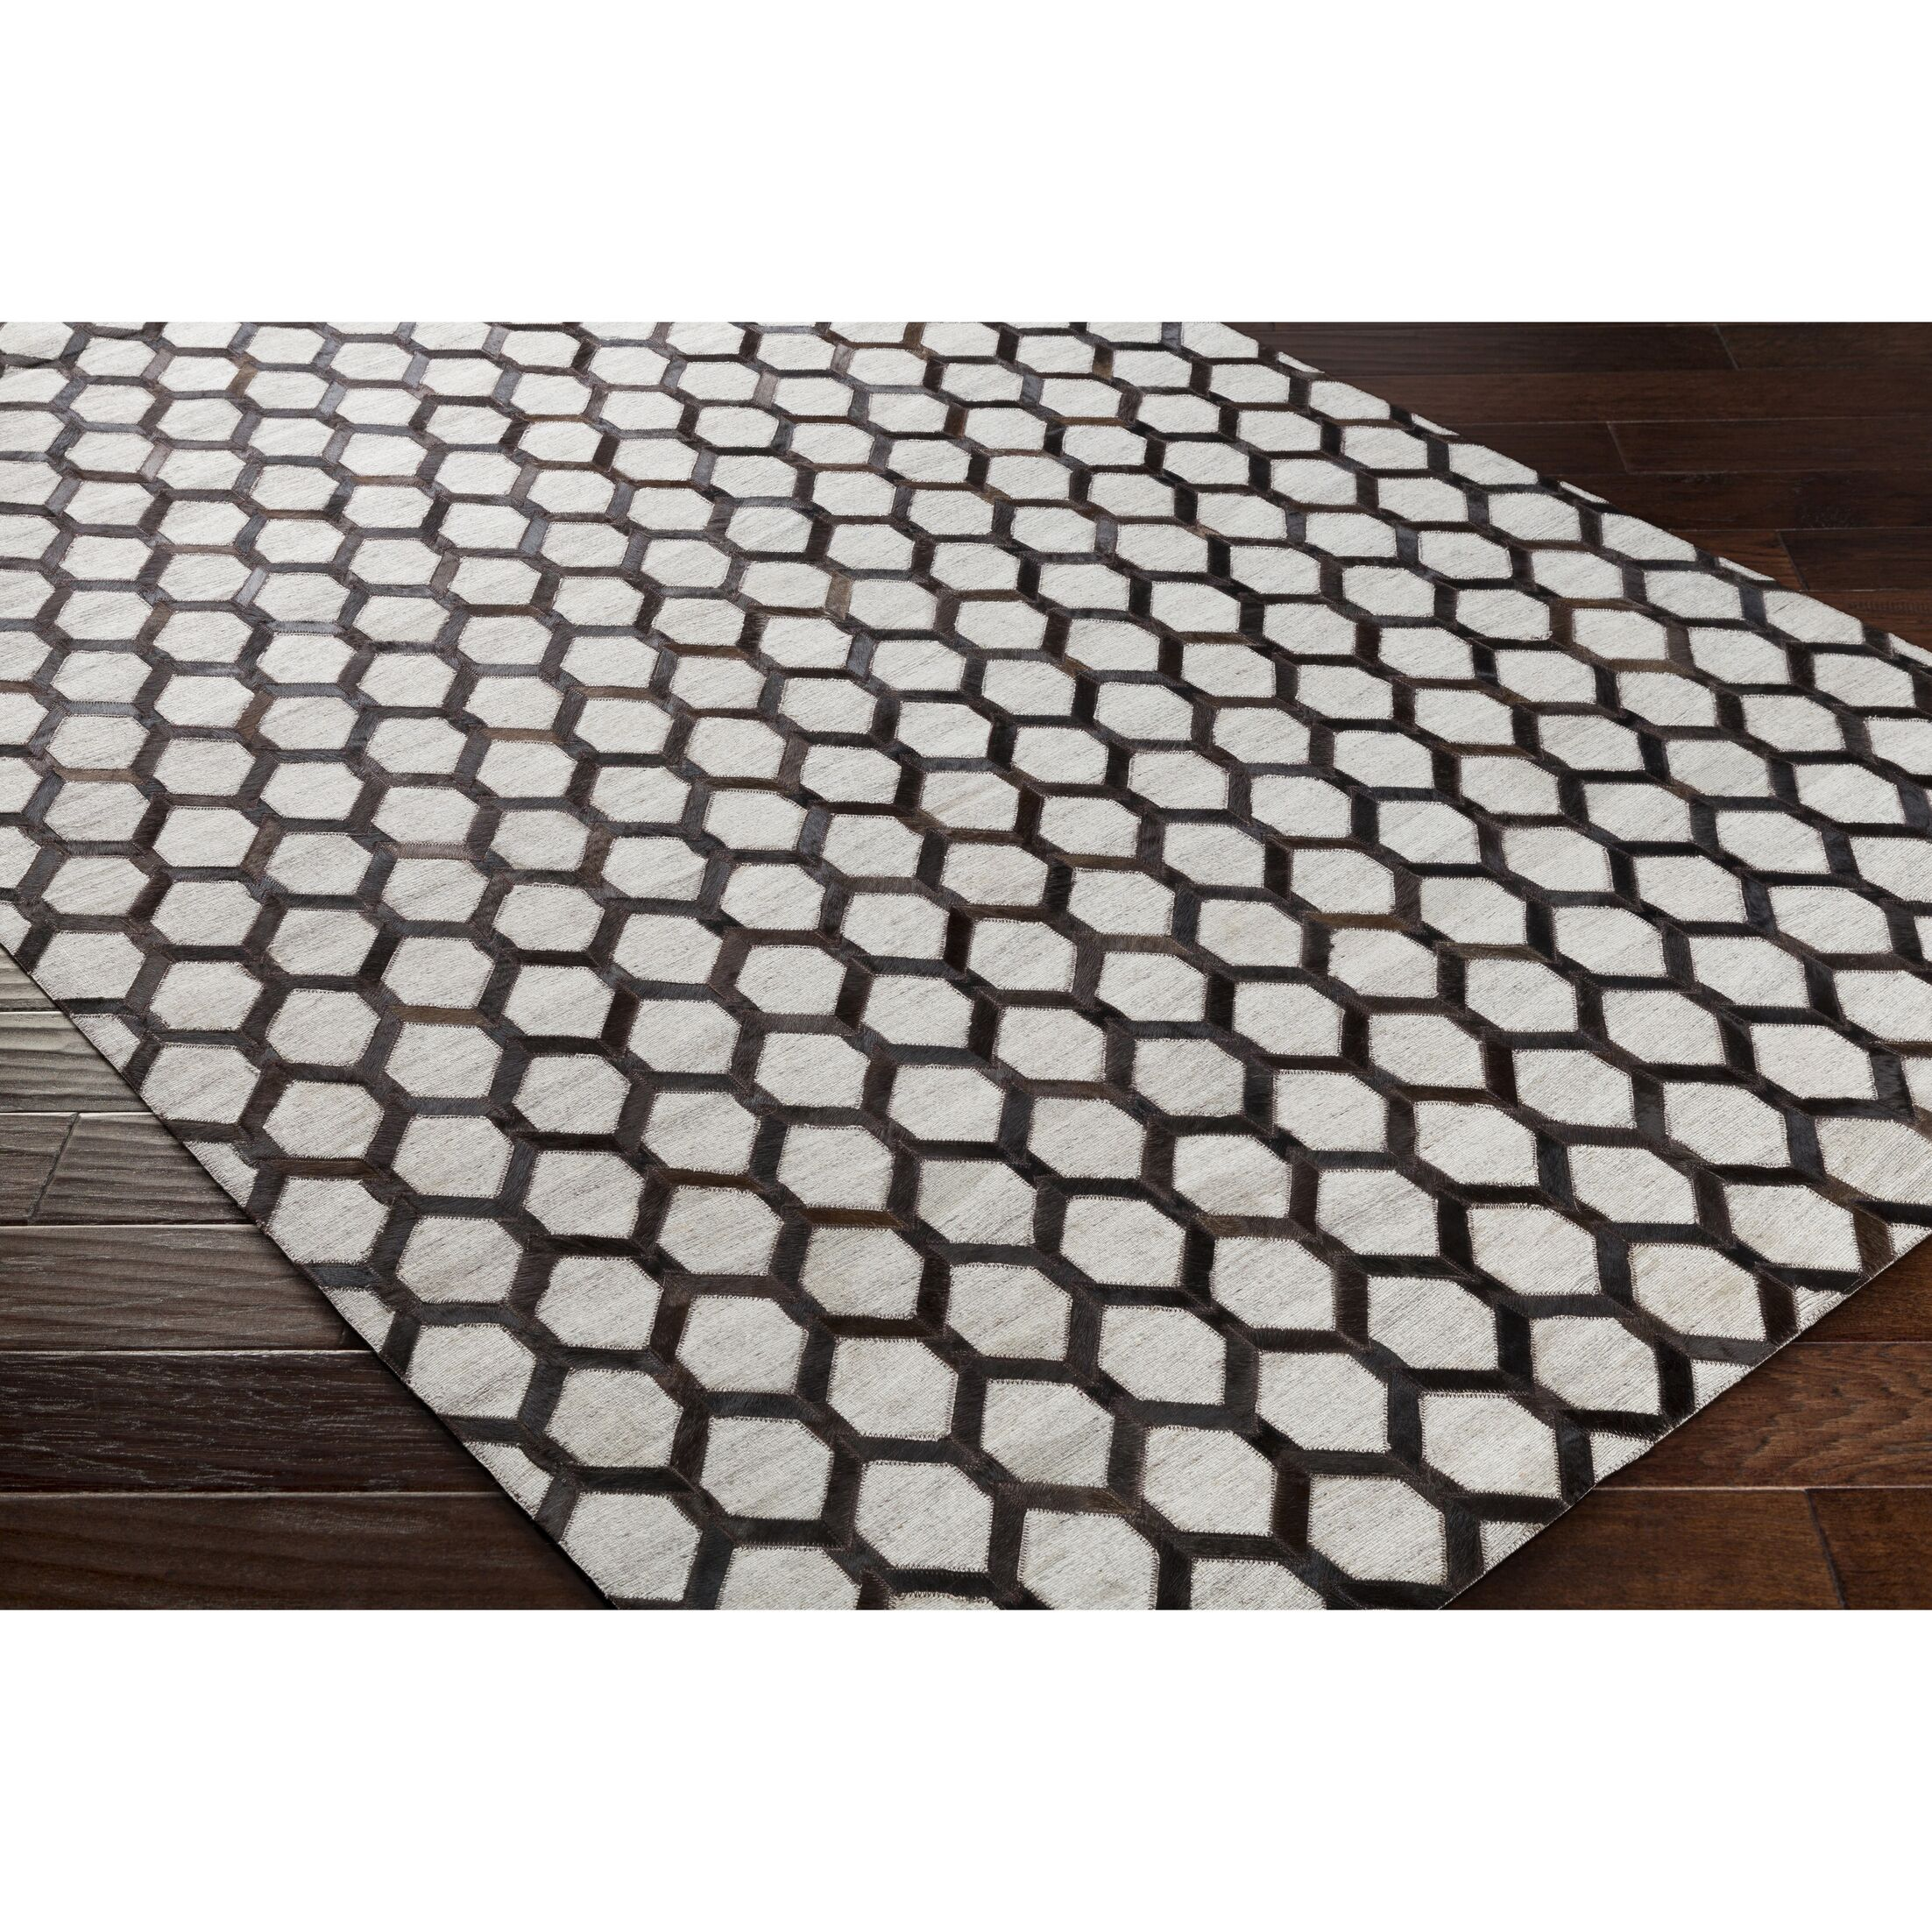 Rexburg Hand-Crafted Black/Brown Indoor Area Rug Rug Size: 5' x 7'6